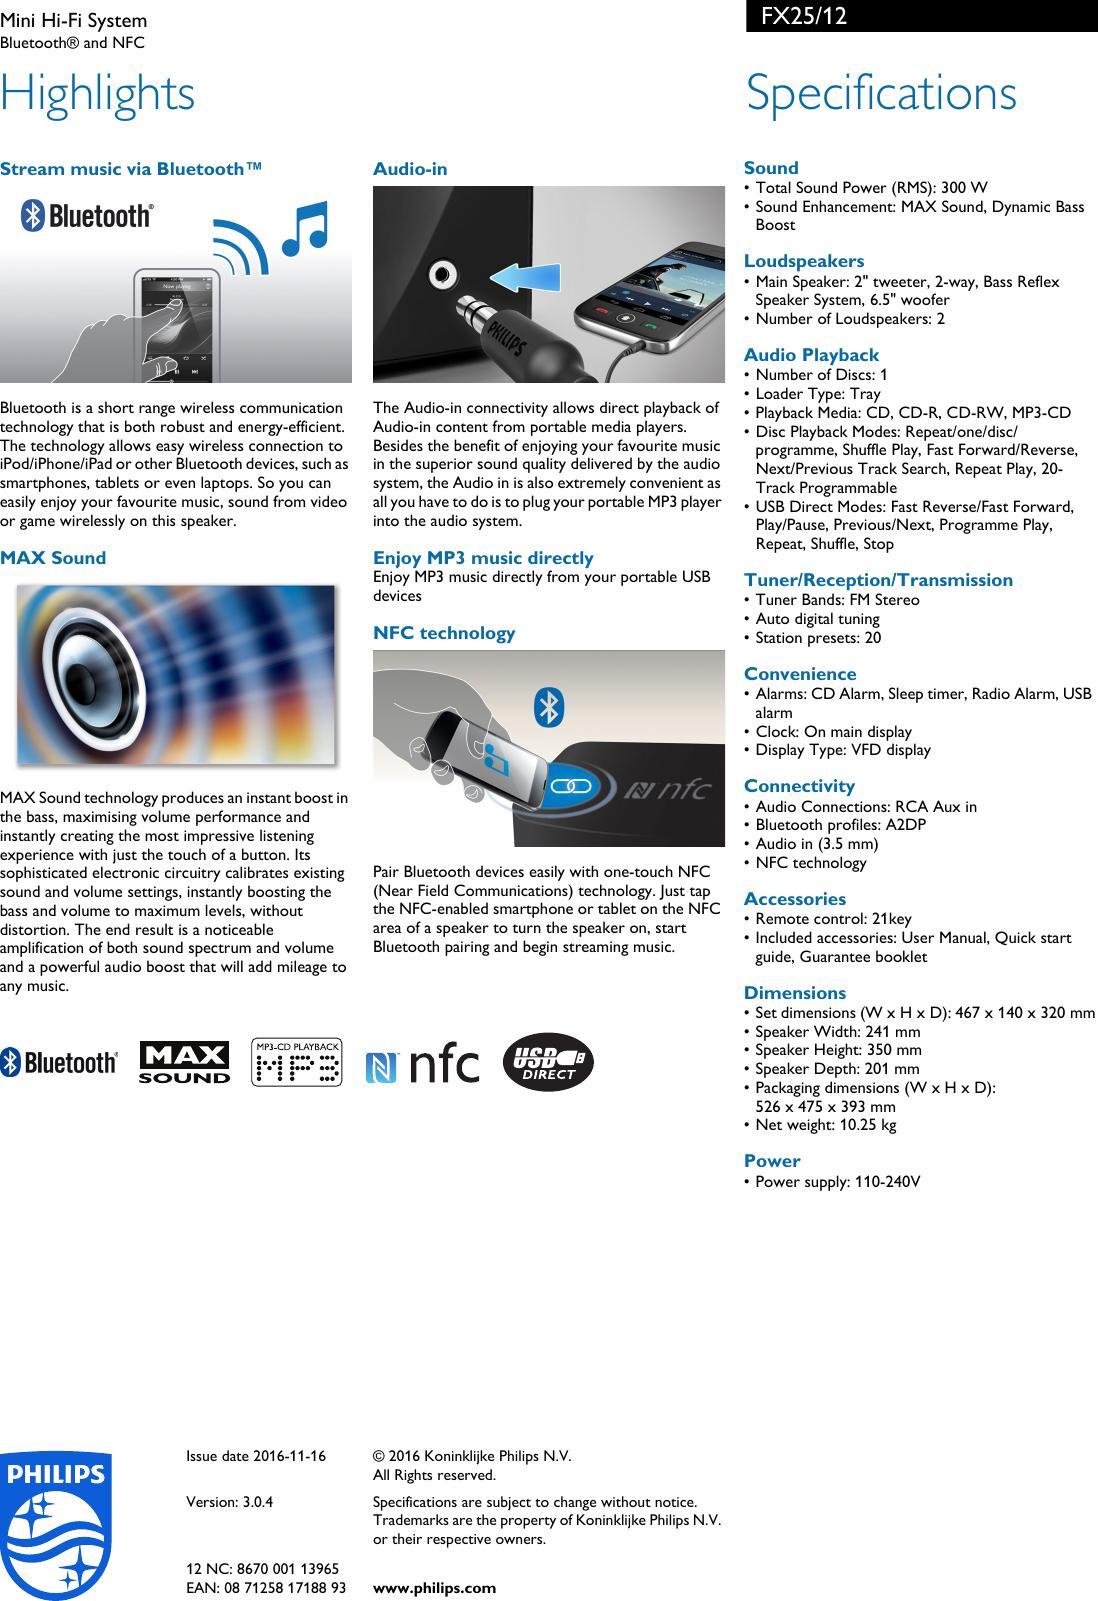 Philips FX25/12 Mini Hi Fi System User Manual Leaflet Fx25